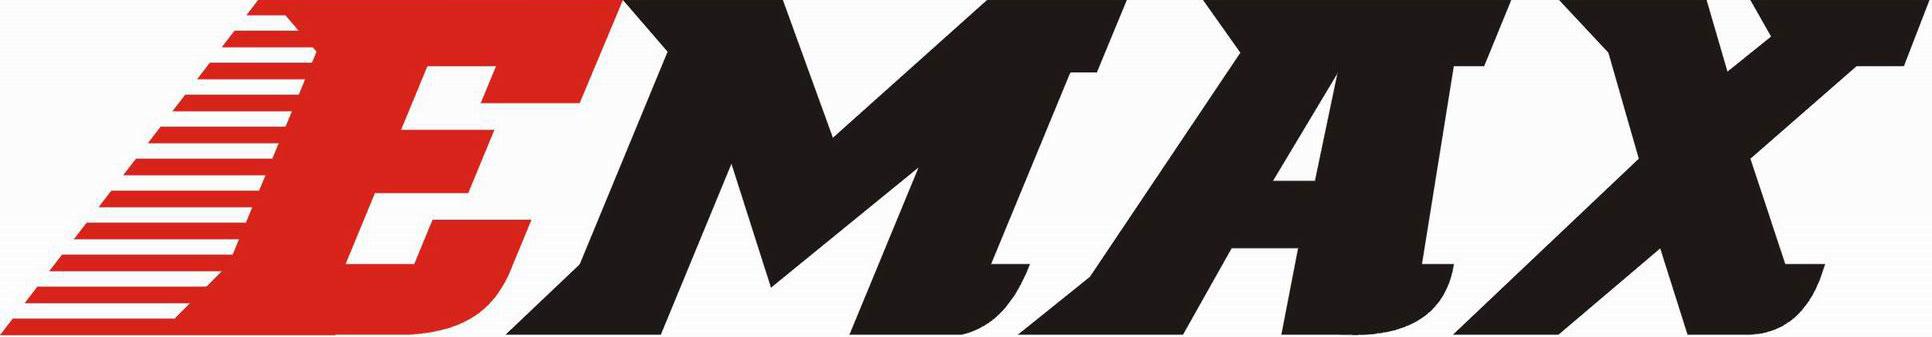 emax-logo.jpg